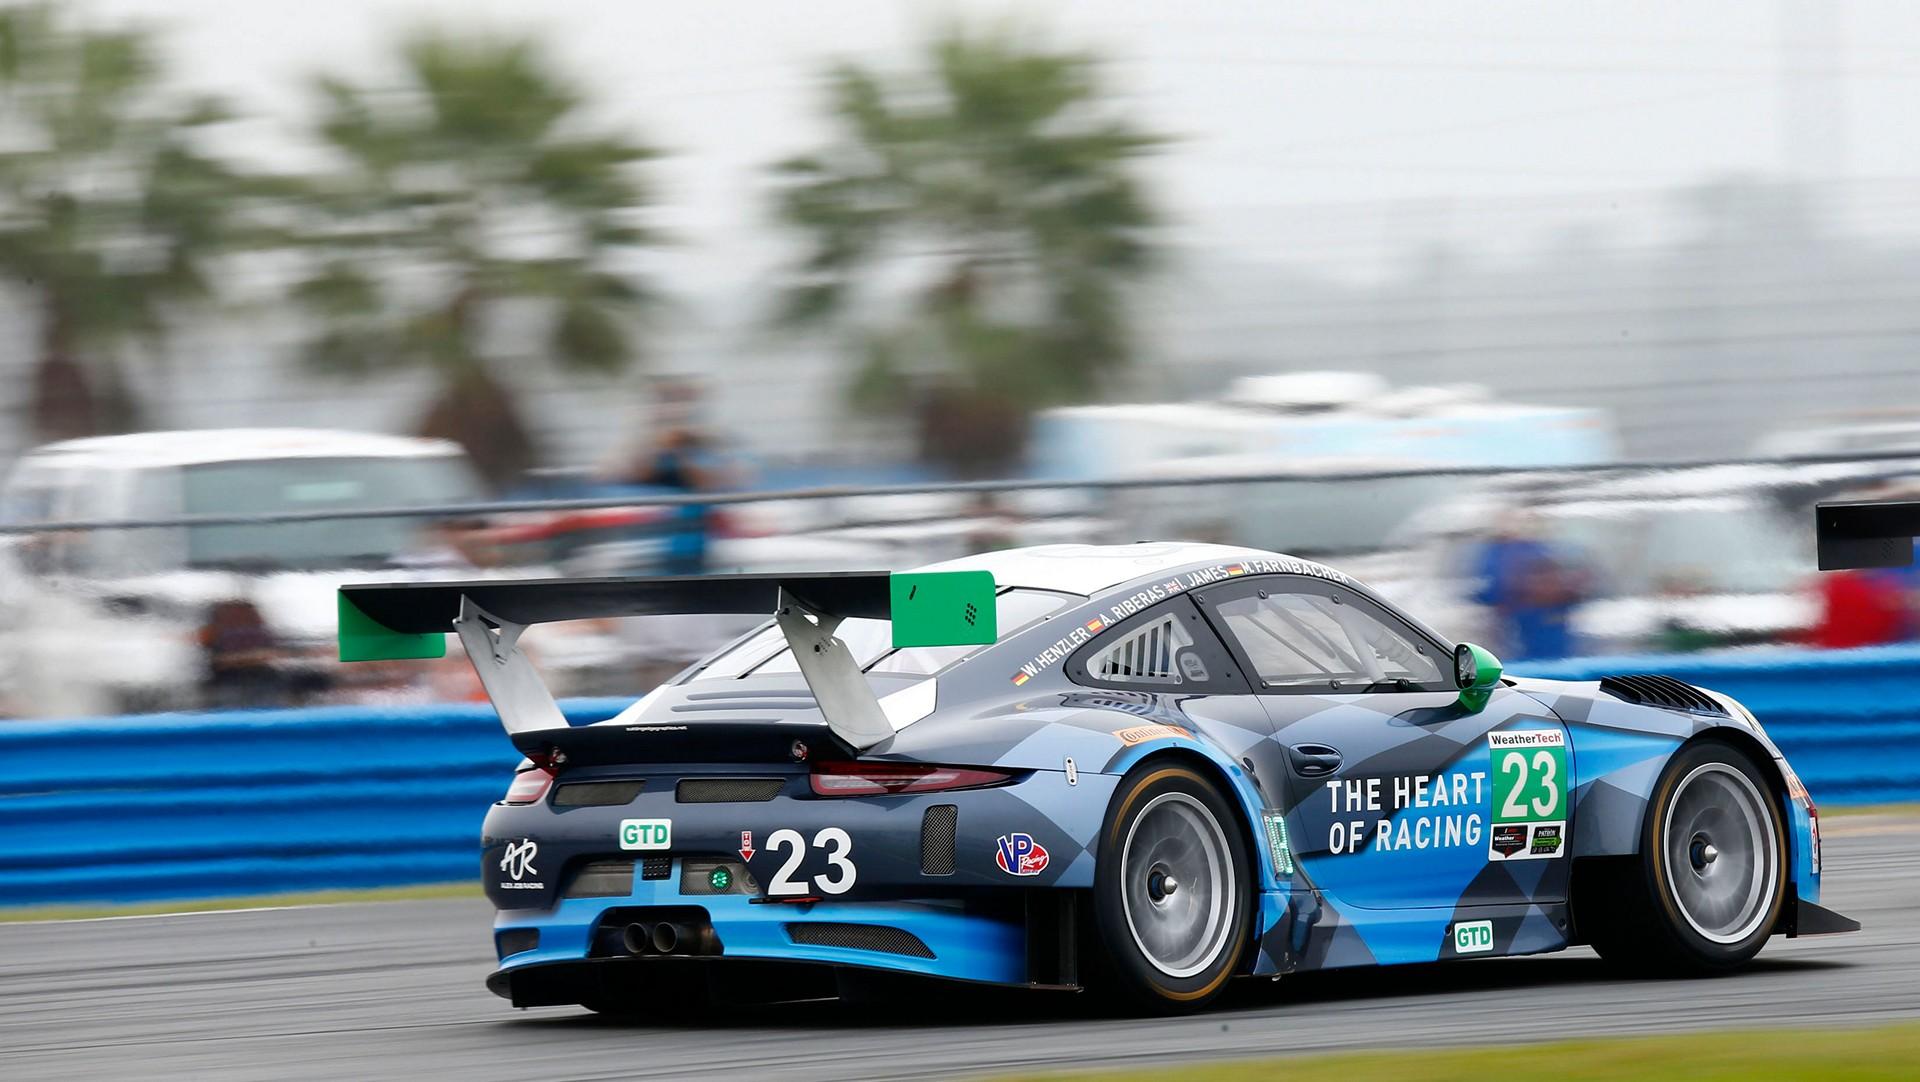 Porsche 911 GT3 R, Daytona, IMSA WeatherTech SportsCar Championship © Dr. Ing. h.c. F. Porsche AG